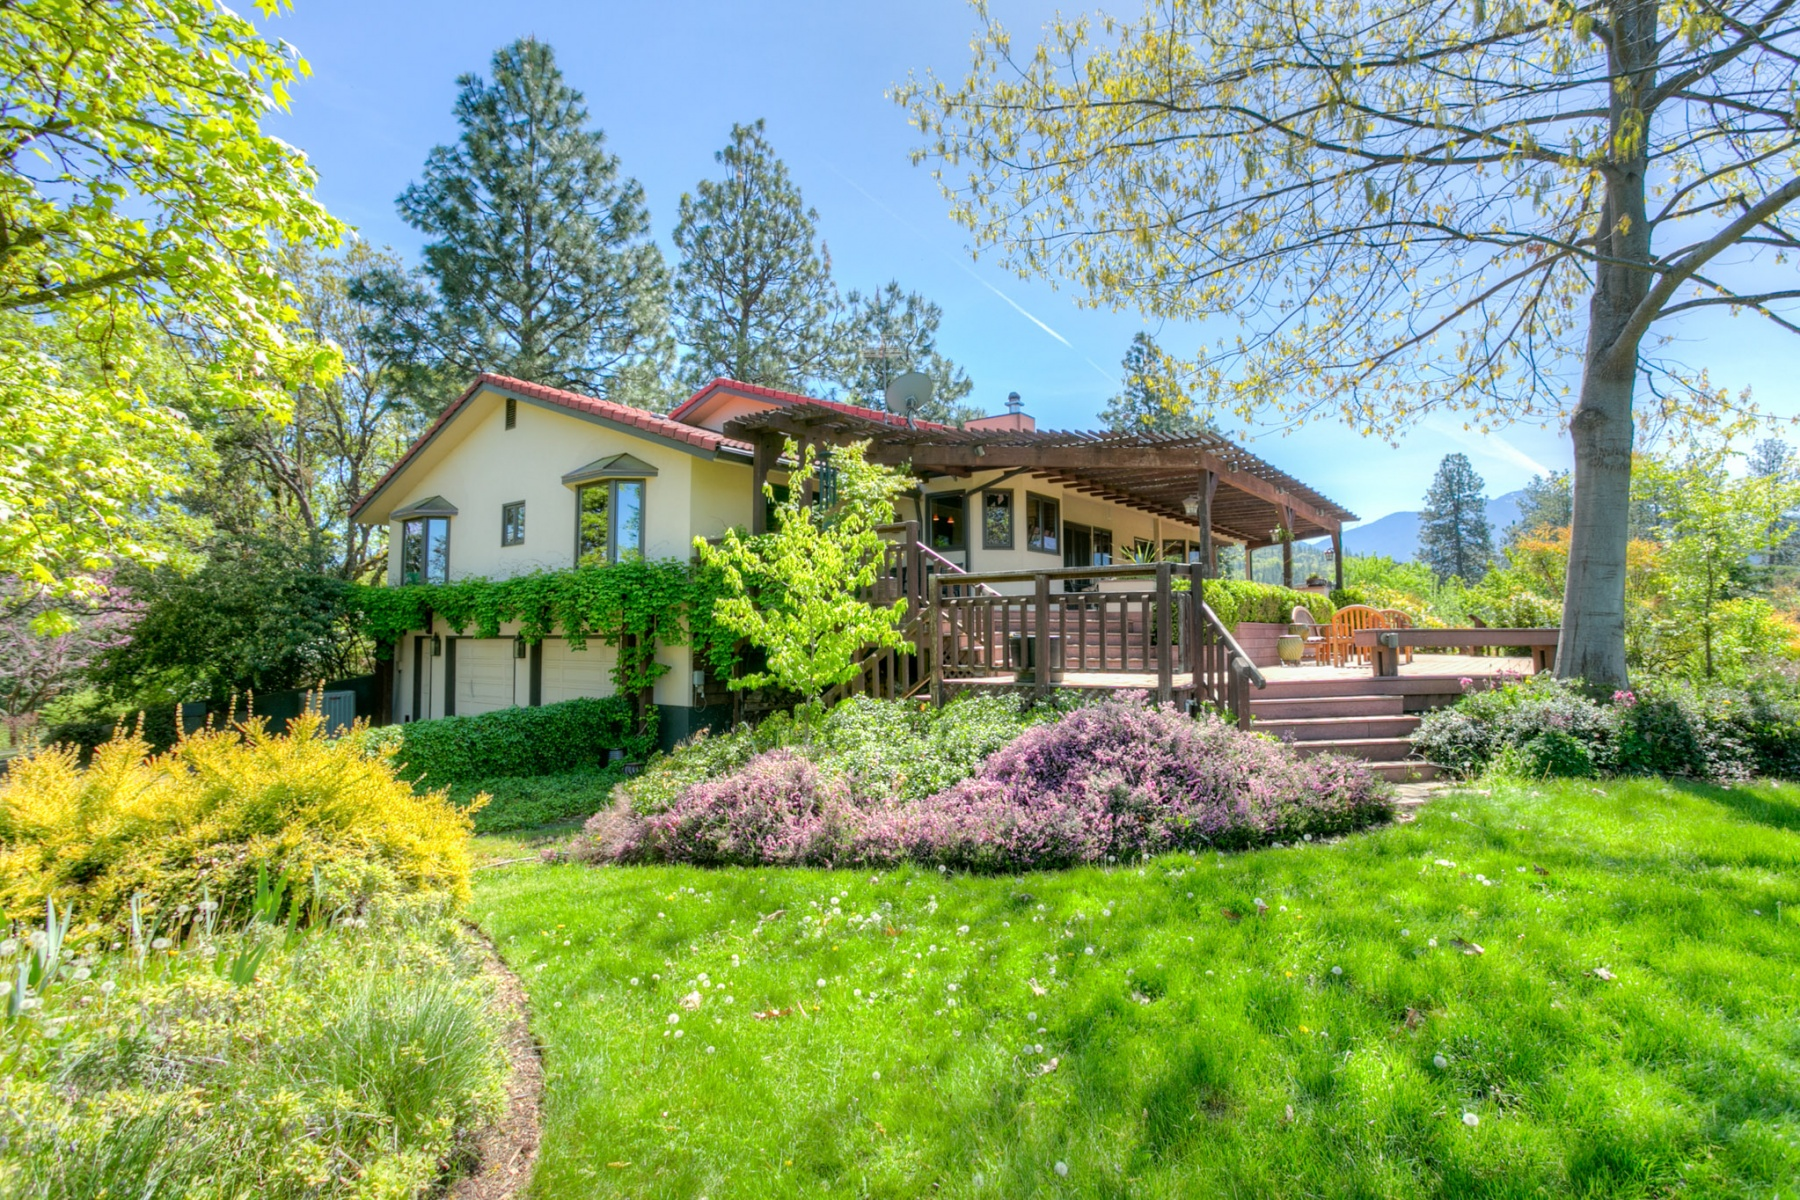 Single Family Home for Sale at Talent Vineyard Estate 7140 Rapp Ln Talent, Oregon, 97540 United States